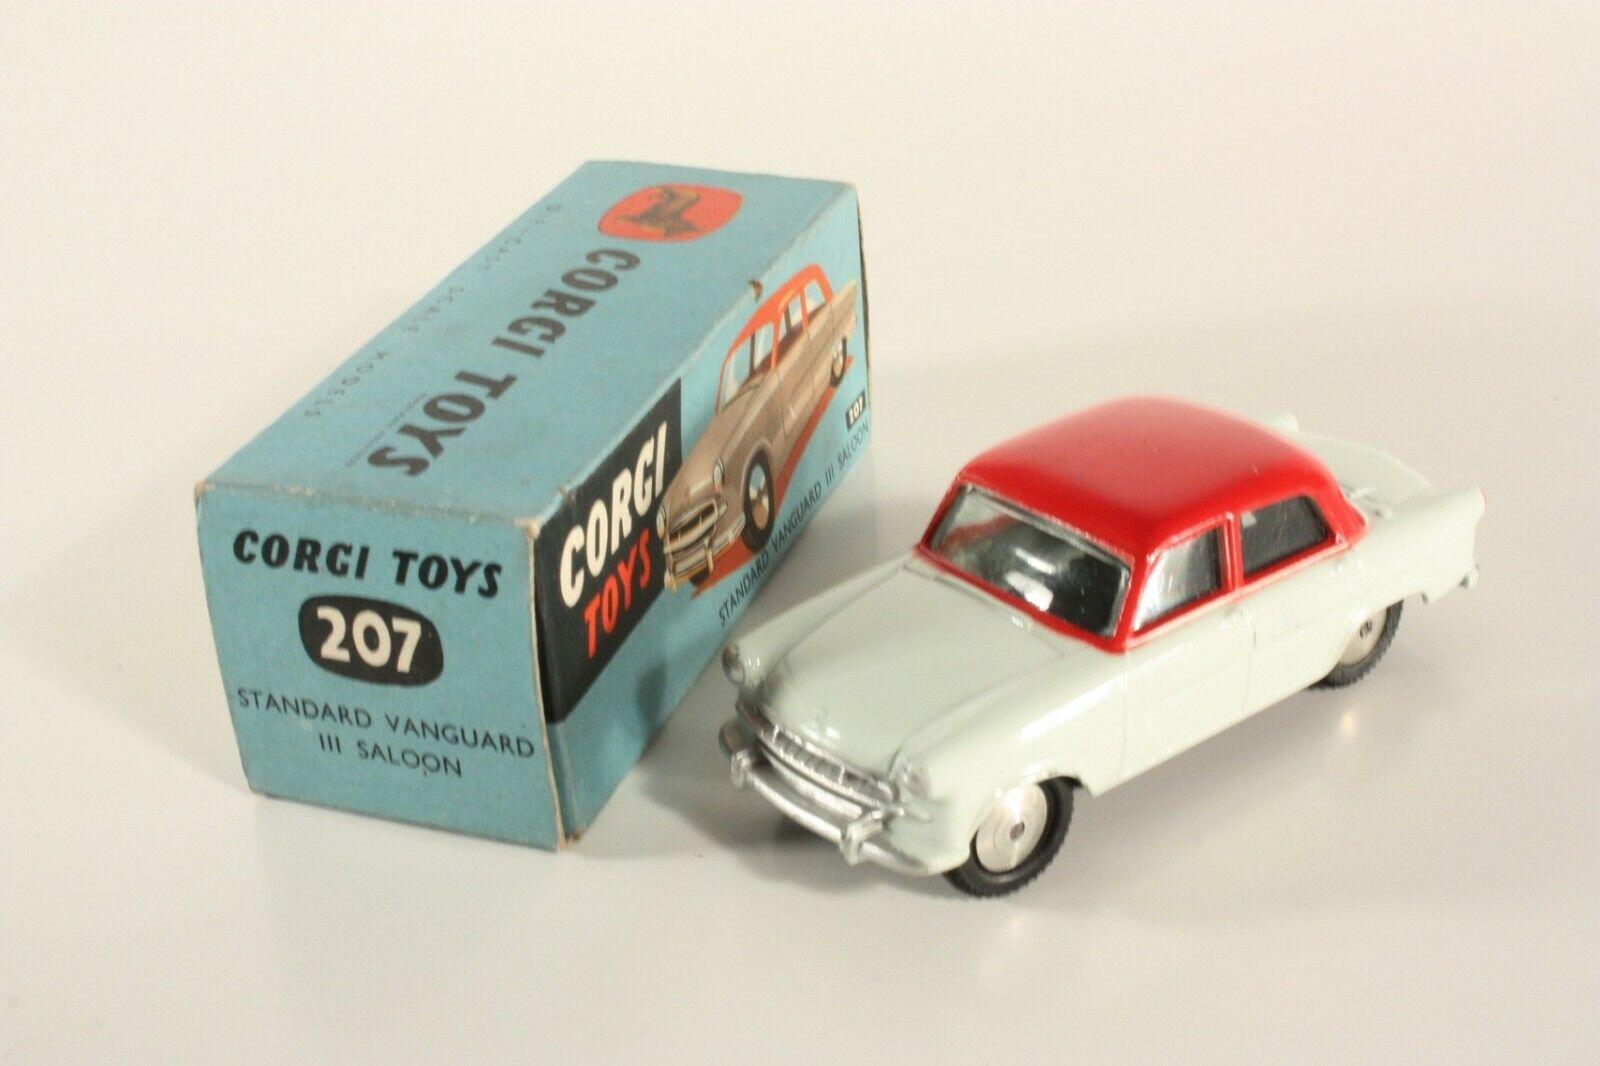 Corgi Toys 207 Standard Vanguard III Saloon, Mint in Box  ab2260